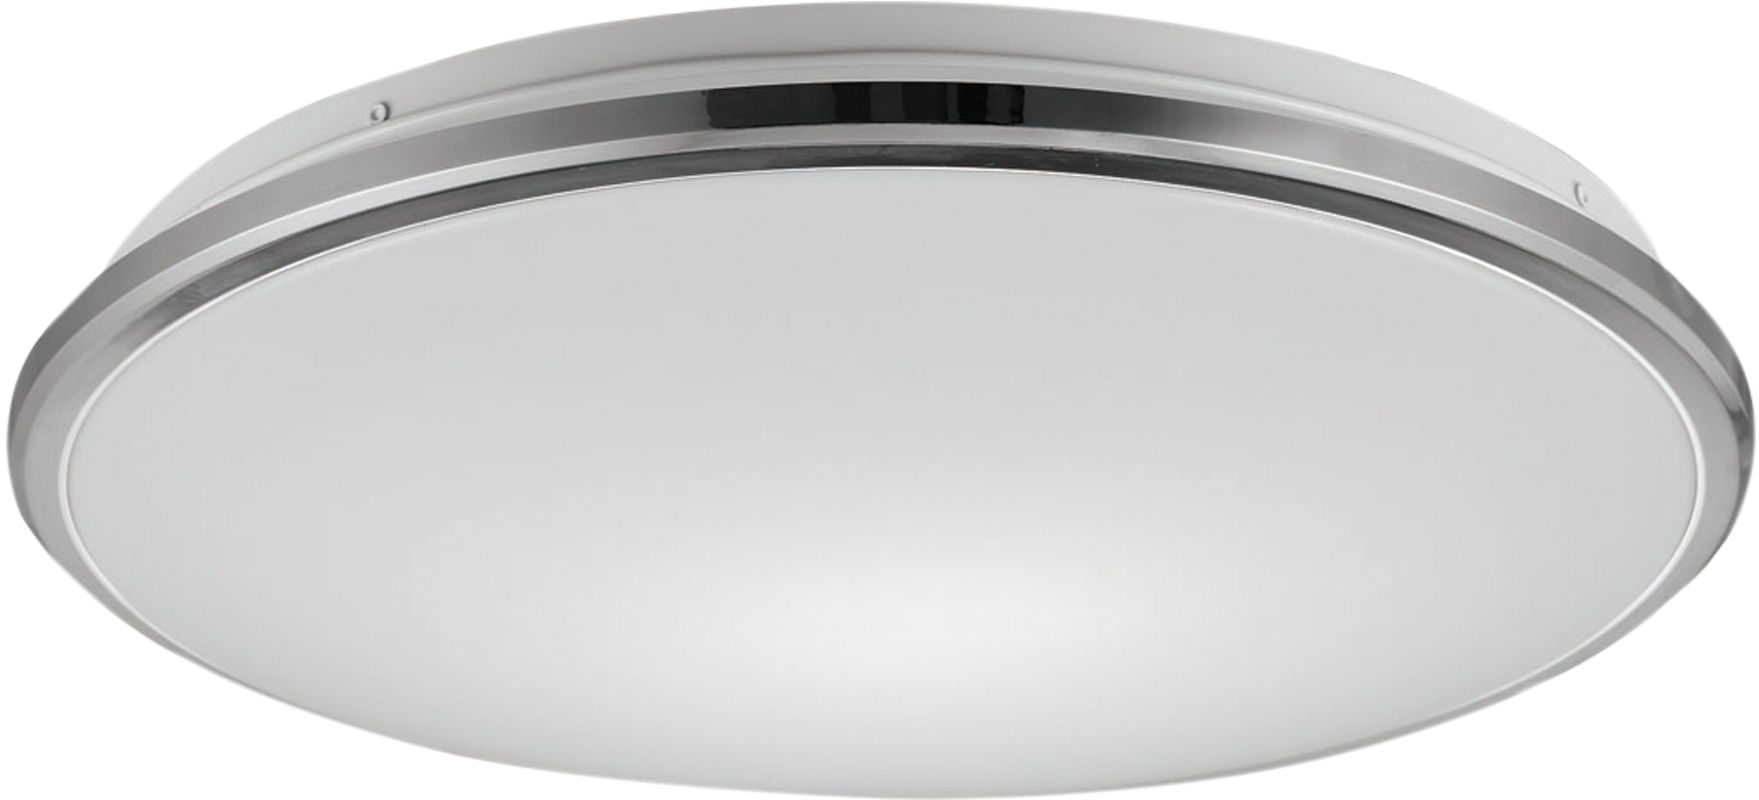 Zuma Line 12080022 BELLIS plafon lampa sufitowa srebrny LED 24W 4000K 38cm